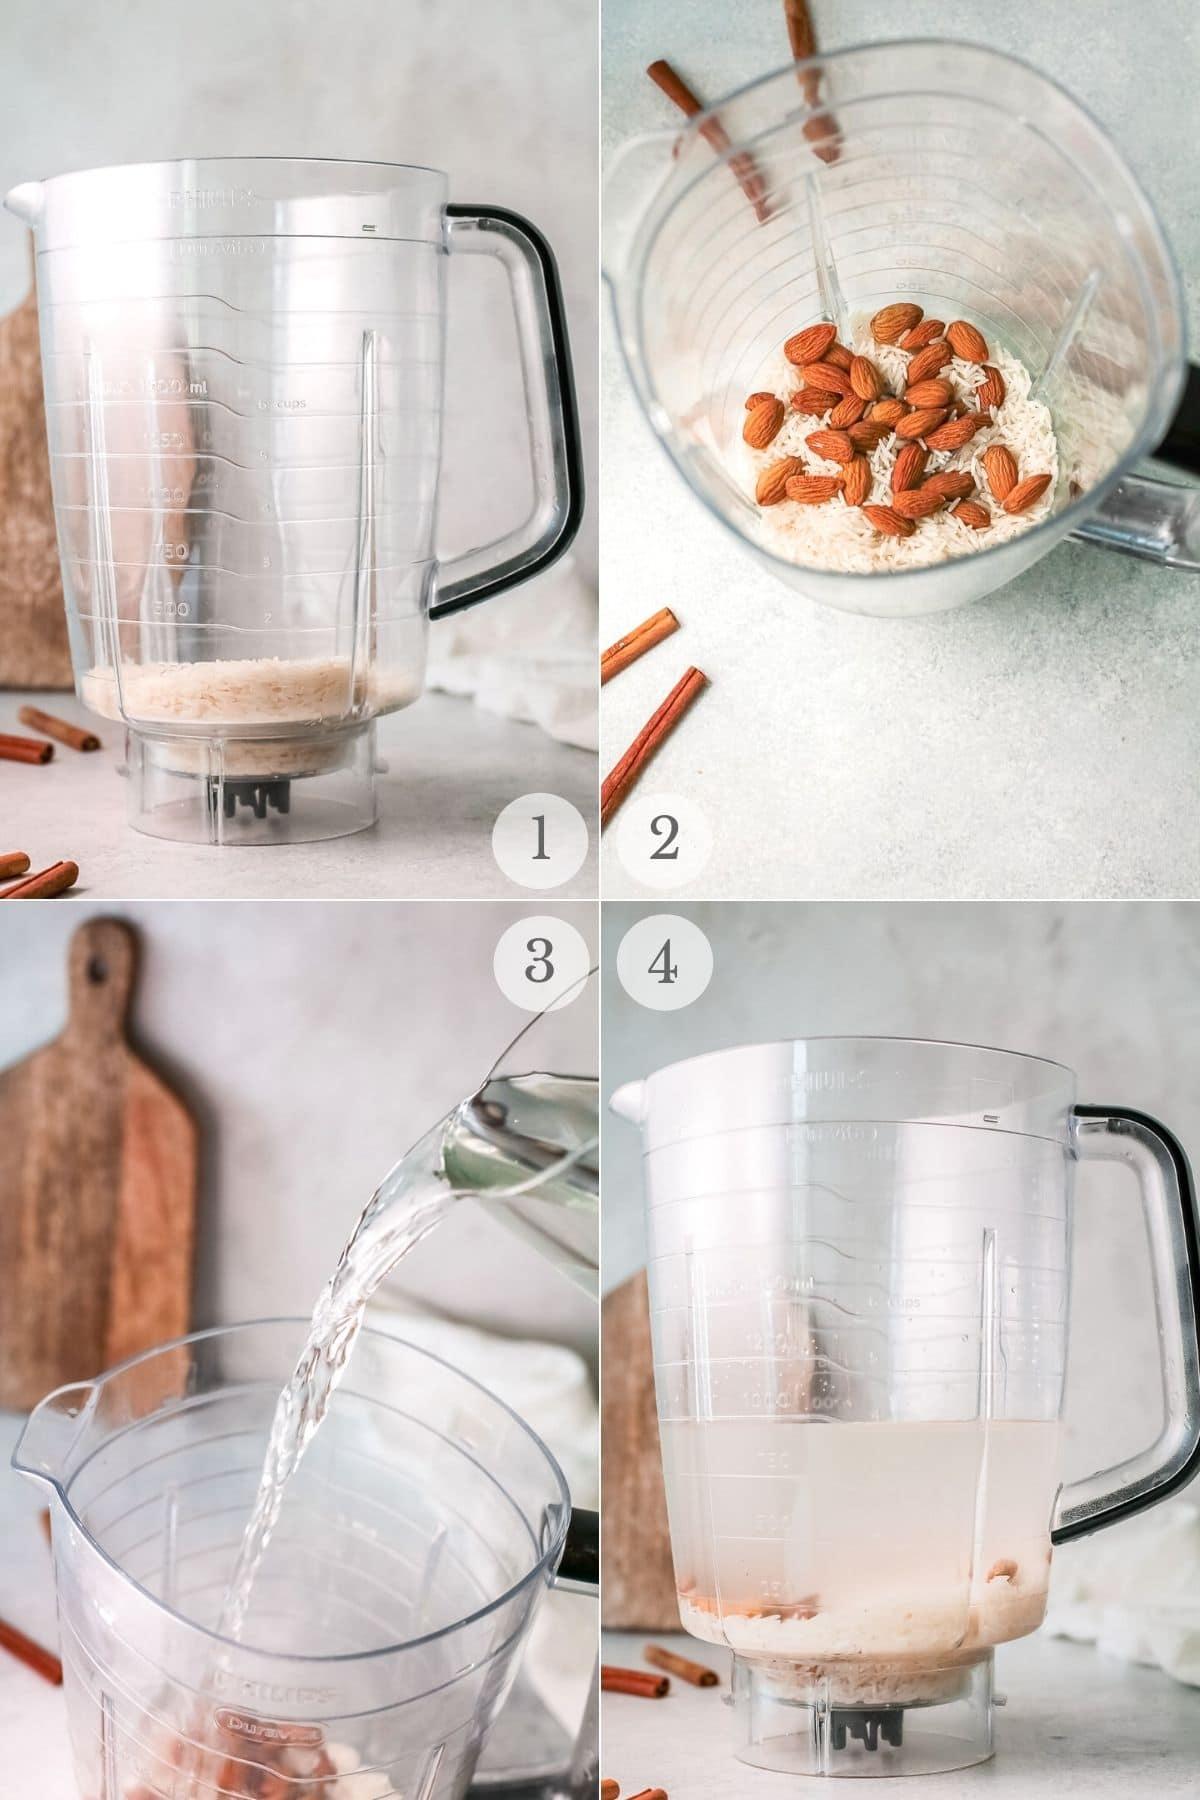 horchata recipe steps 1-4